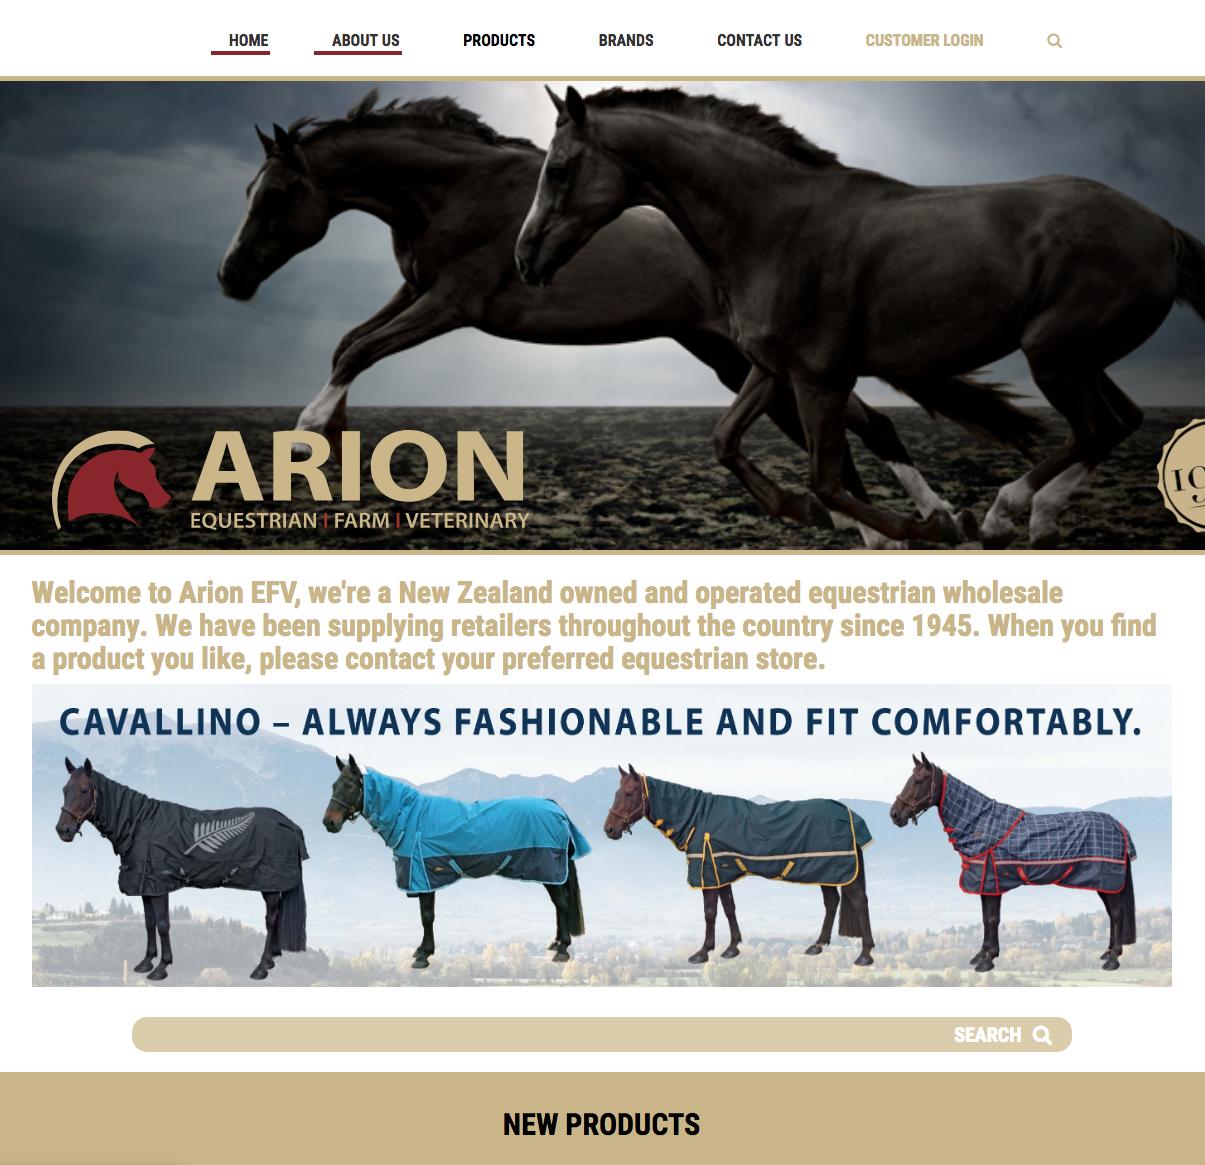 ARION EFV - HORSE GEAR